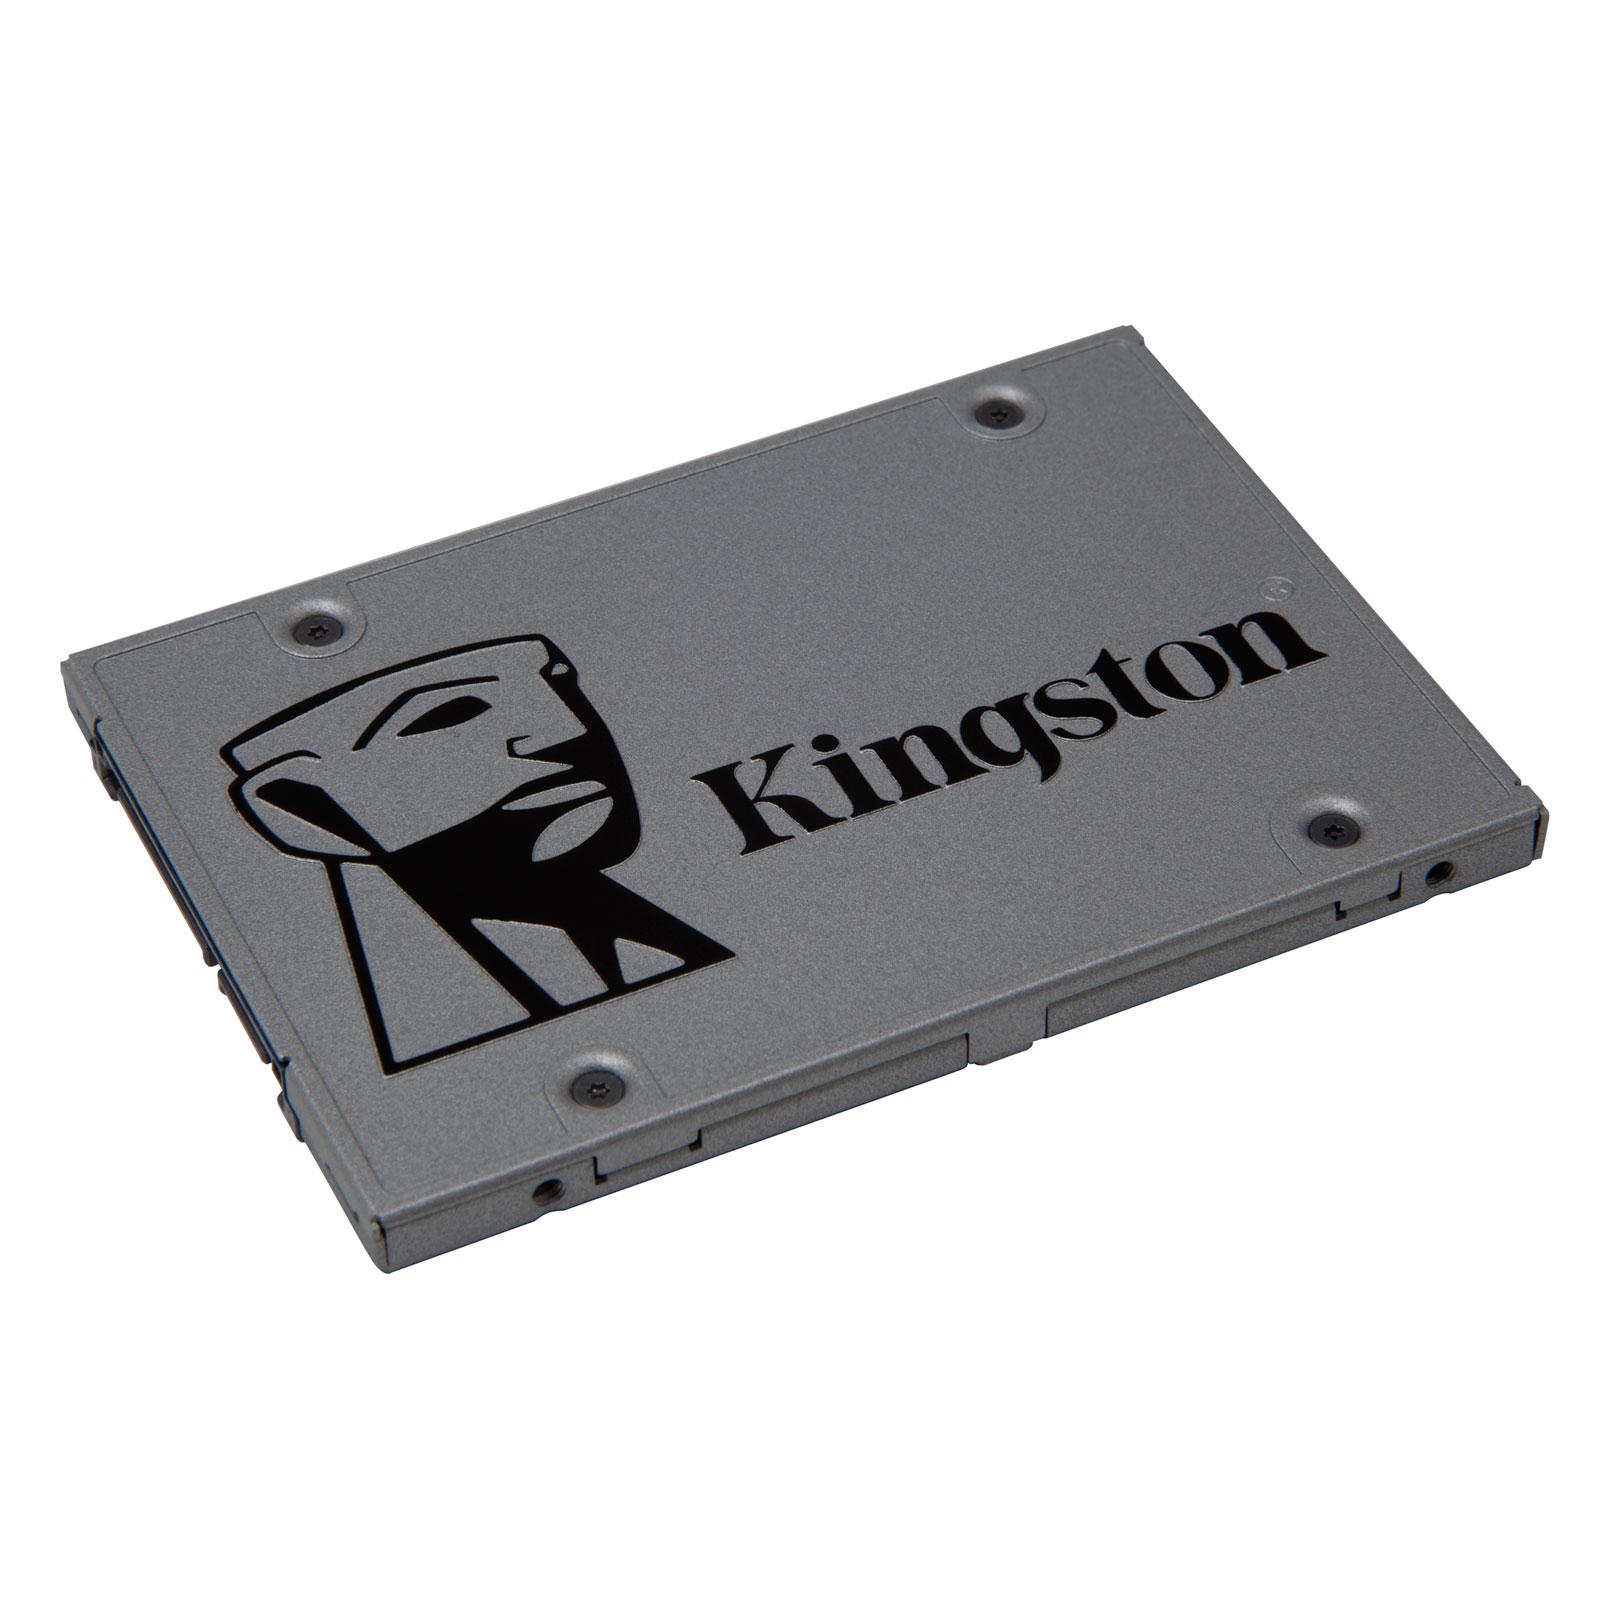 "Disque SSD Kingston SSD UV500 480 Go SSD 480 Go 2.5"" 7mm Serial ATA 6Gb/s"